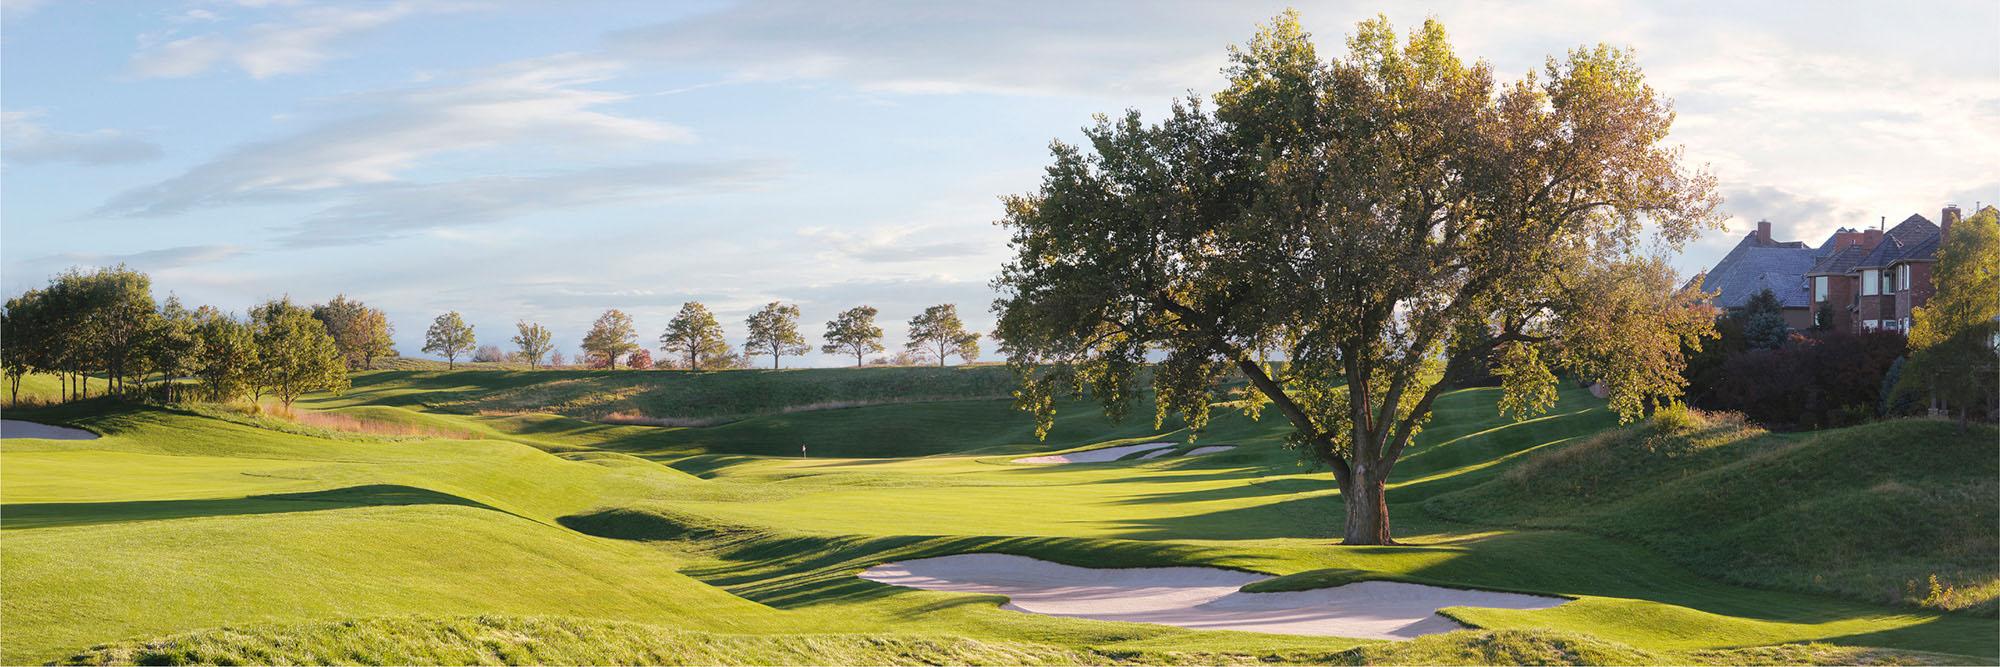 Golf Course Image - Champions No. 18